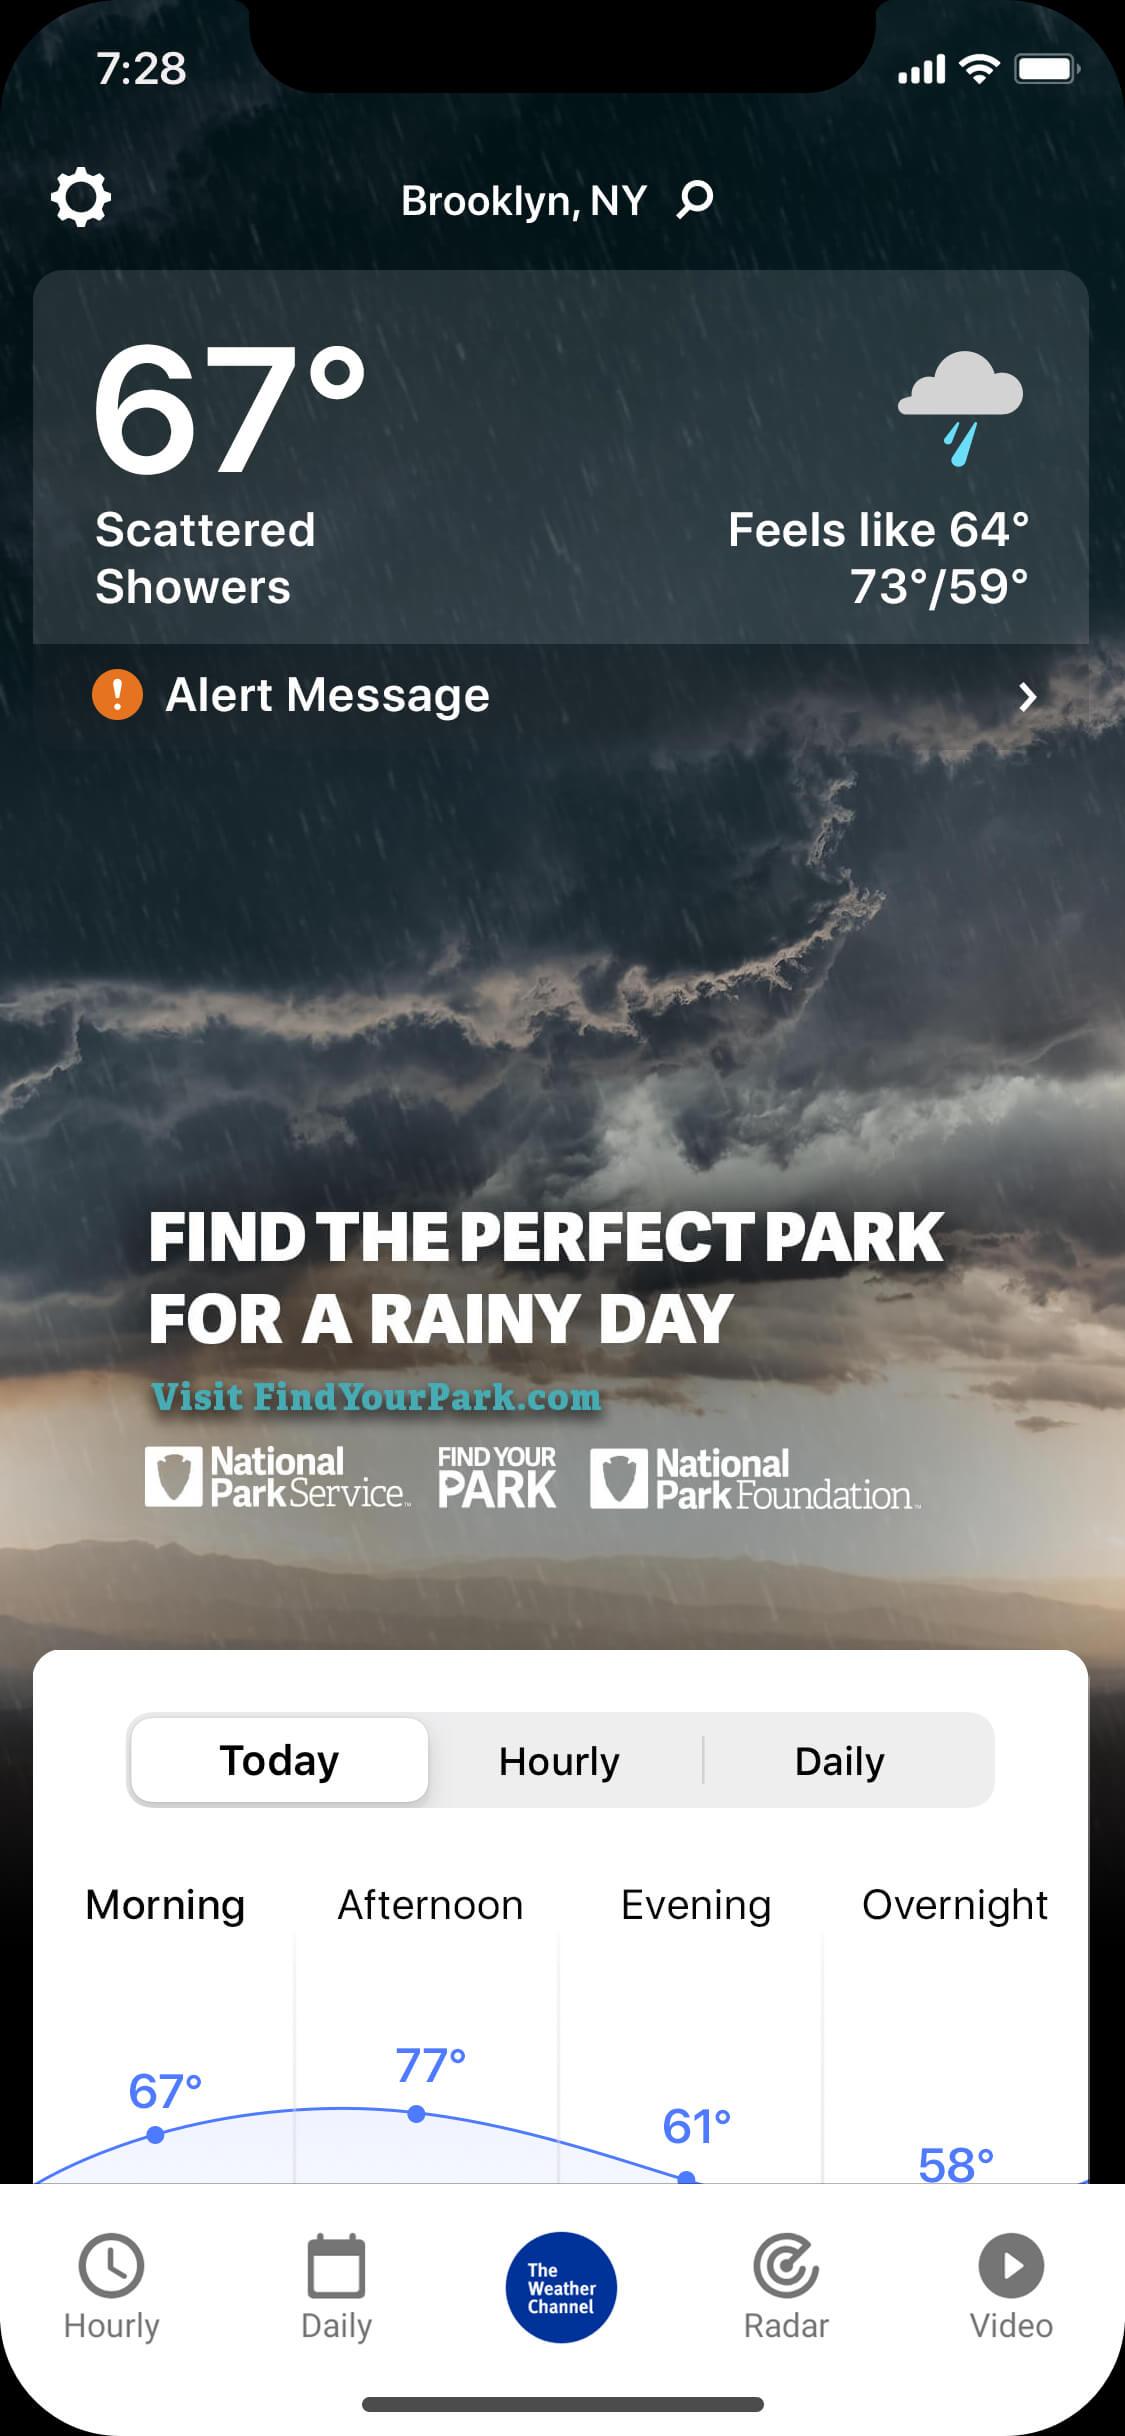 nps_batch1_rainy-day-3.1